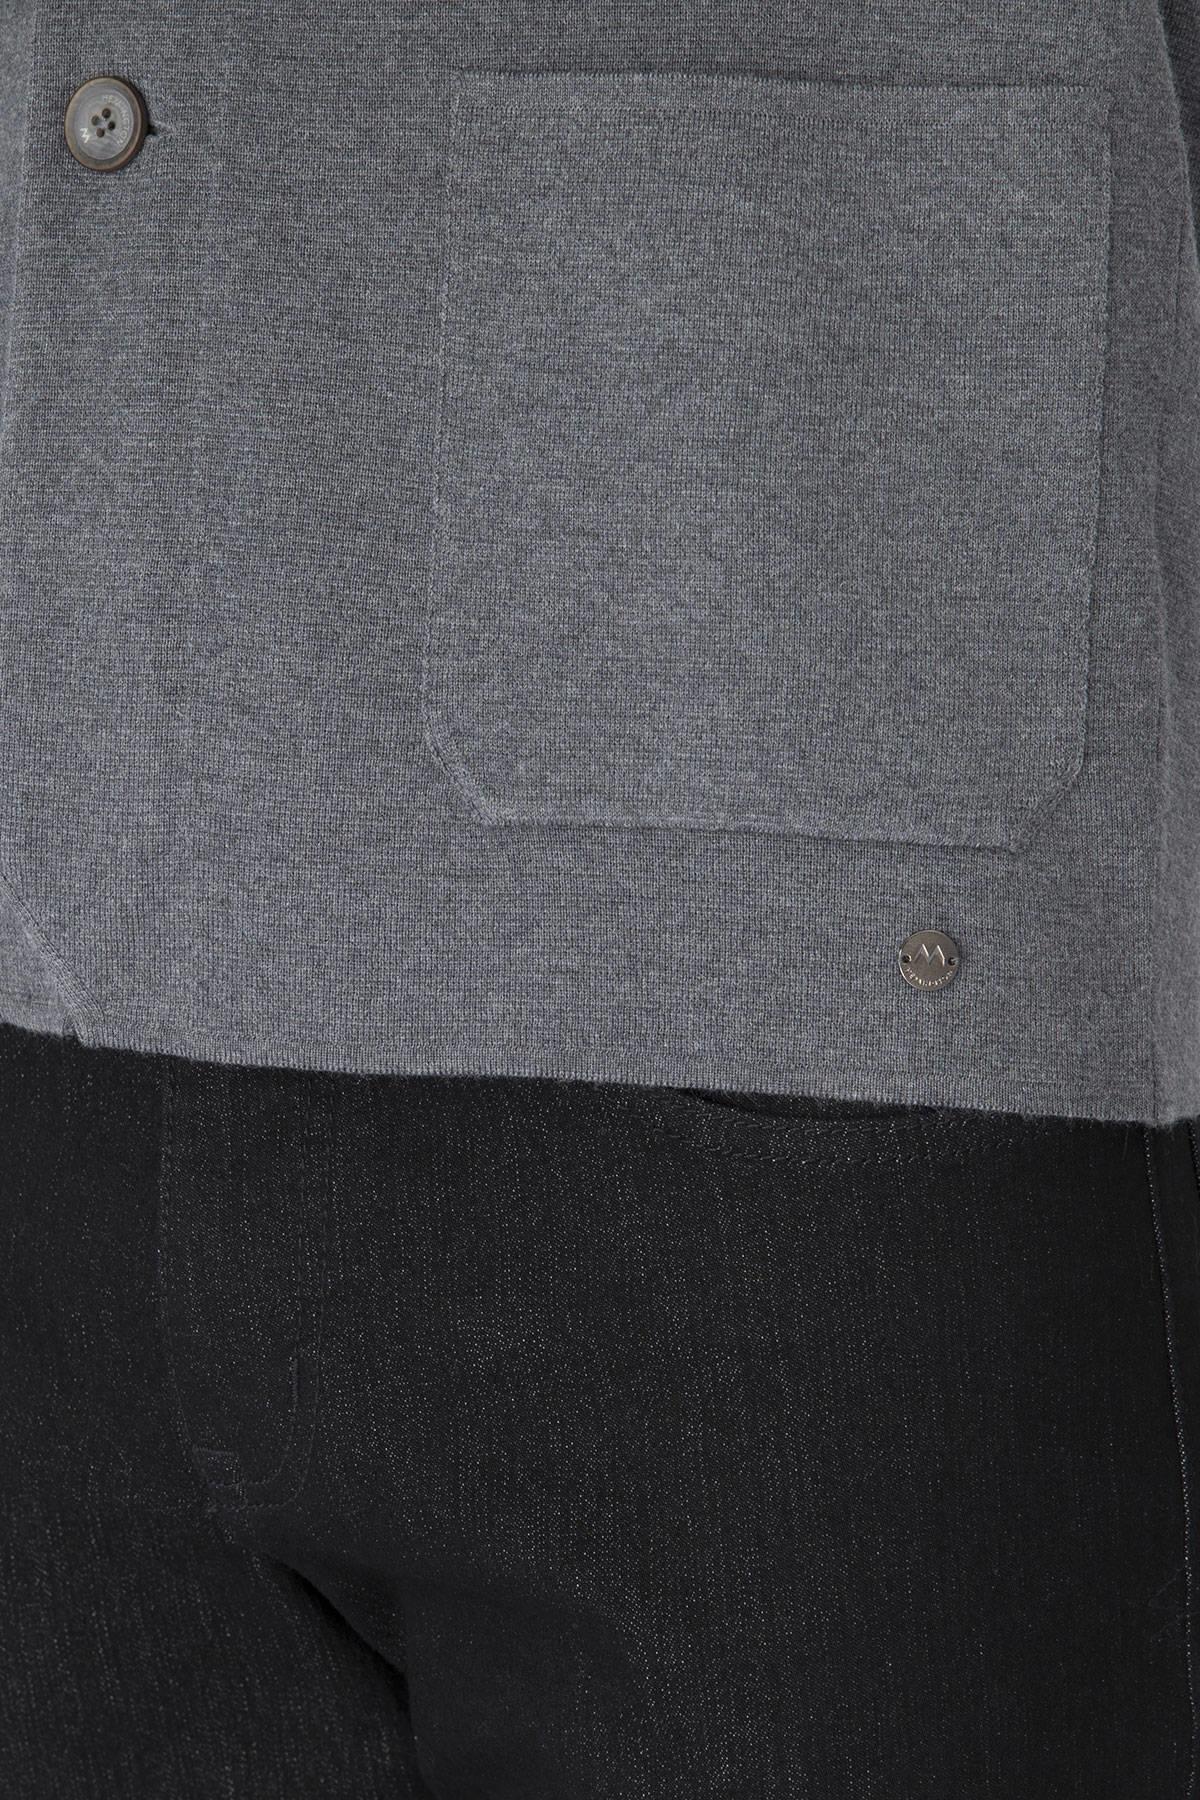 Extrafine Merino Slim Fit Gri Triko Ceket